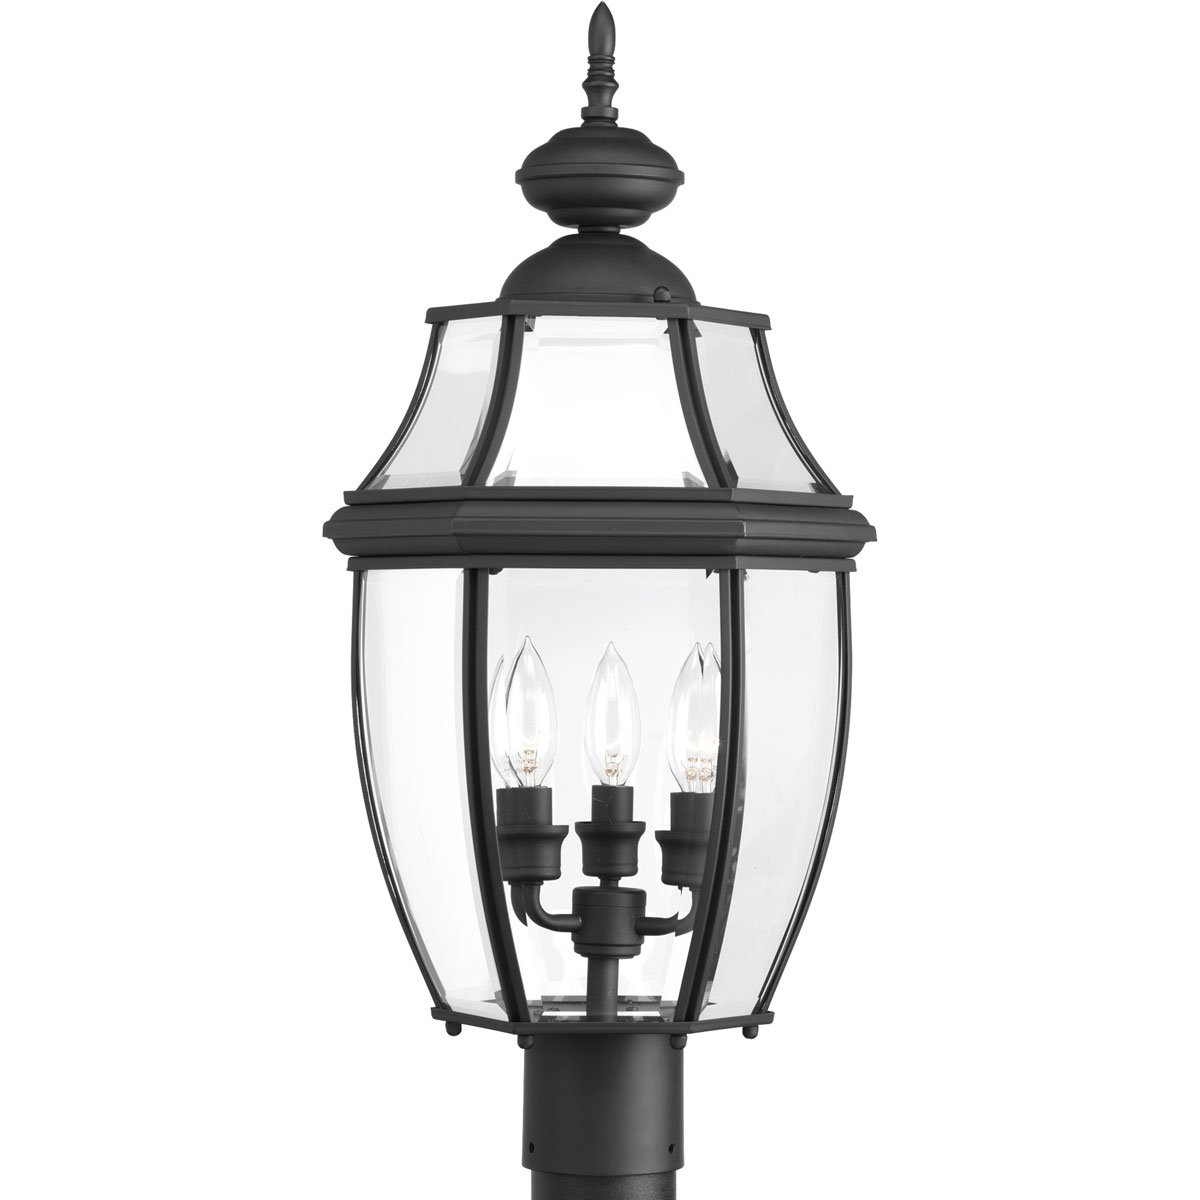 Progress Lighting P6433-31 New Haven Three-Light Post Lantern, Stainless Steel